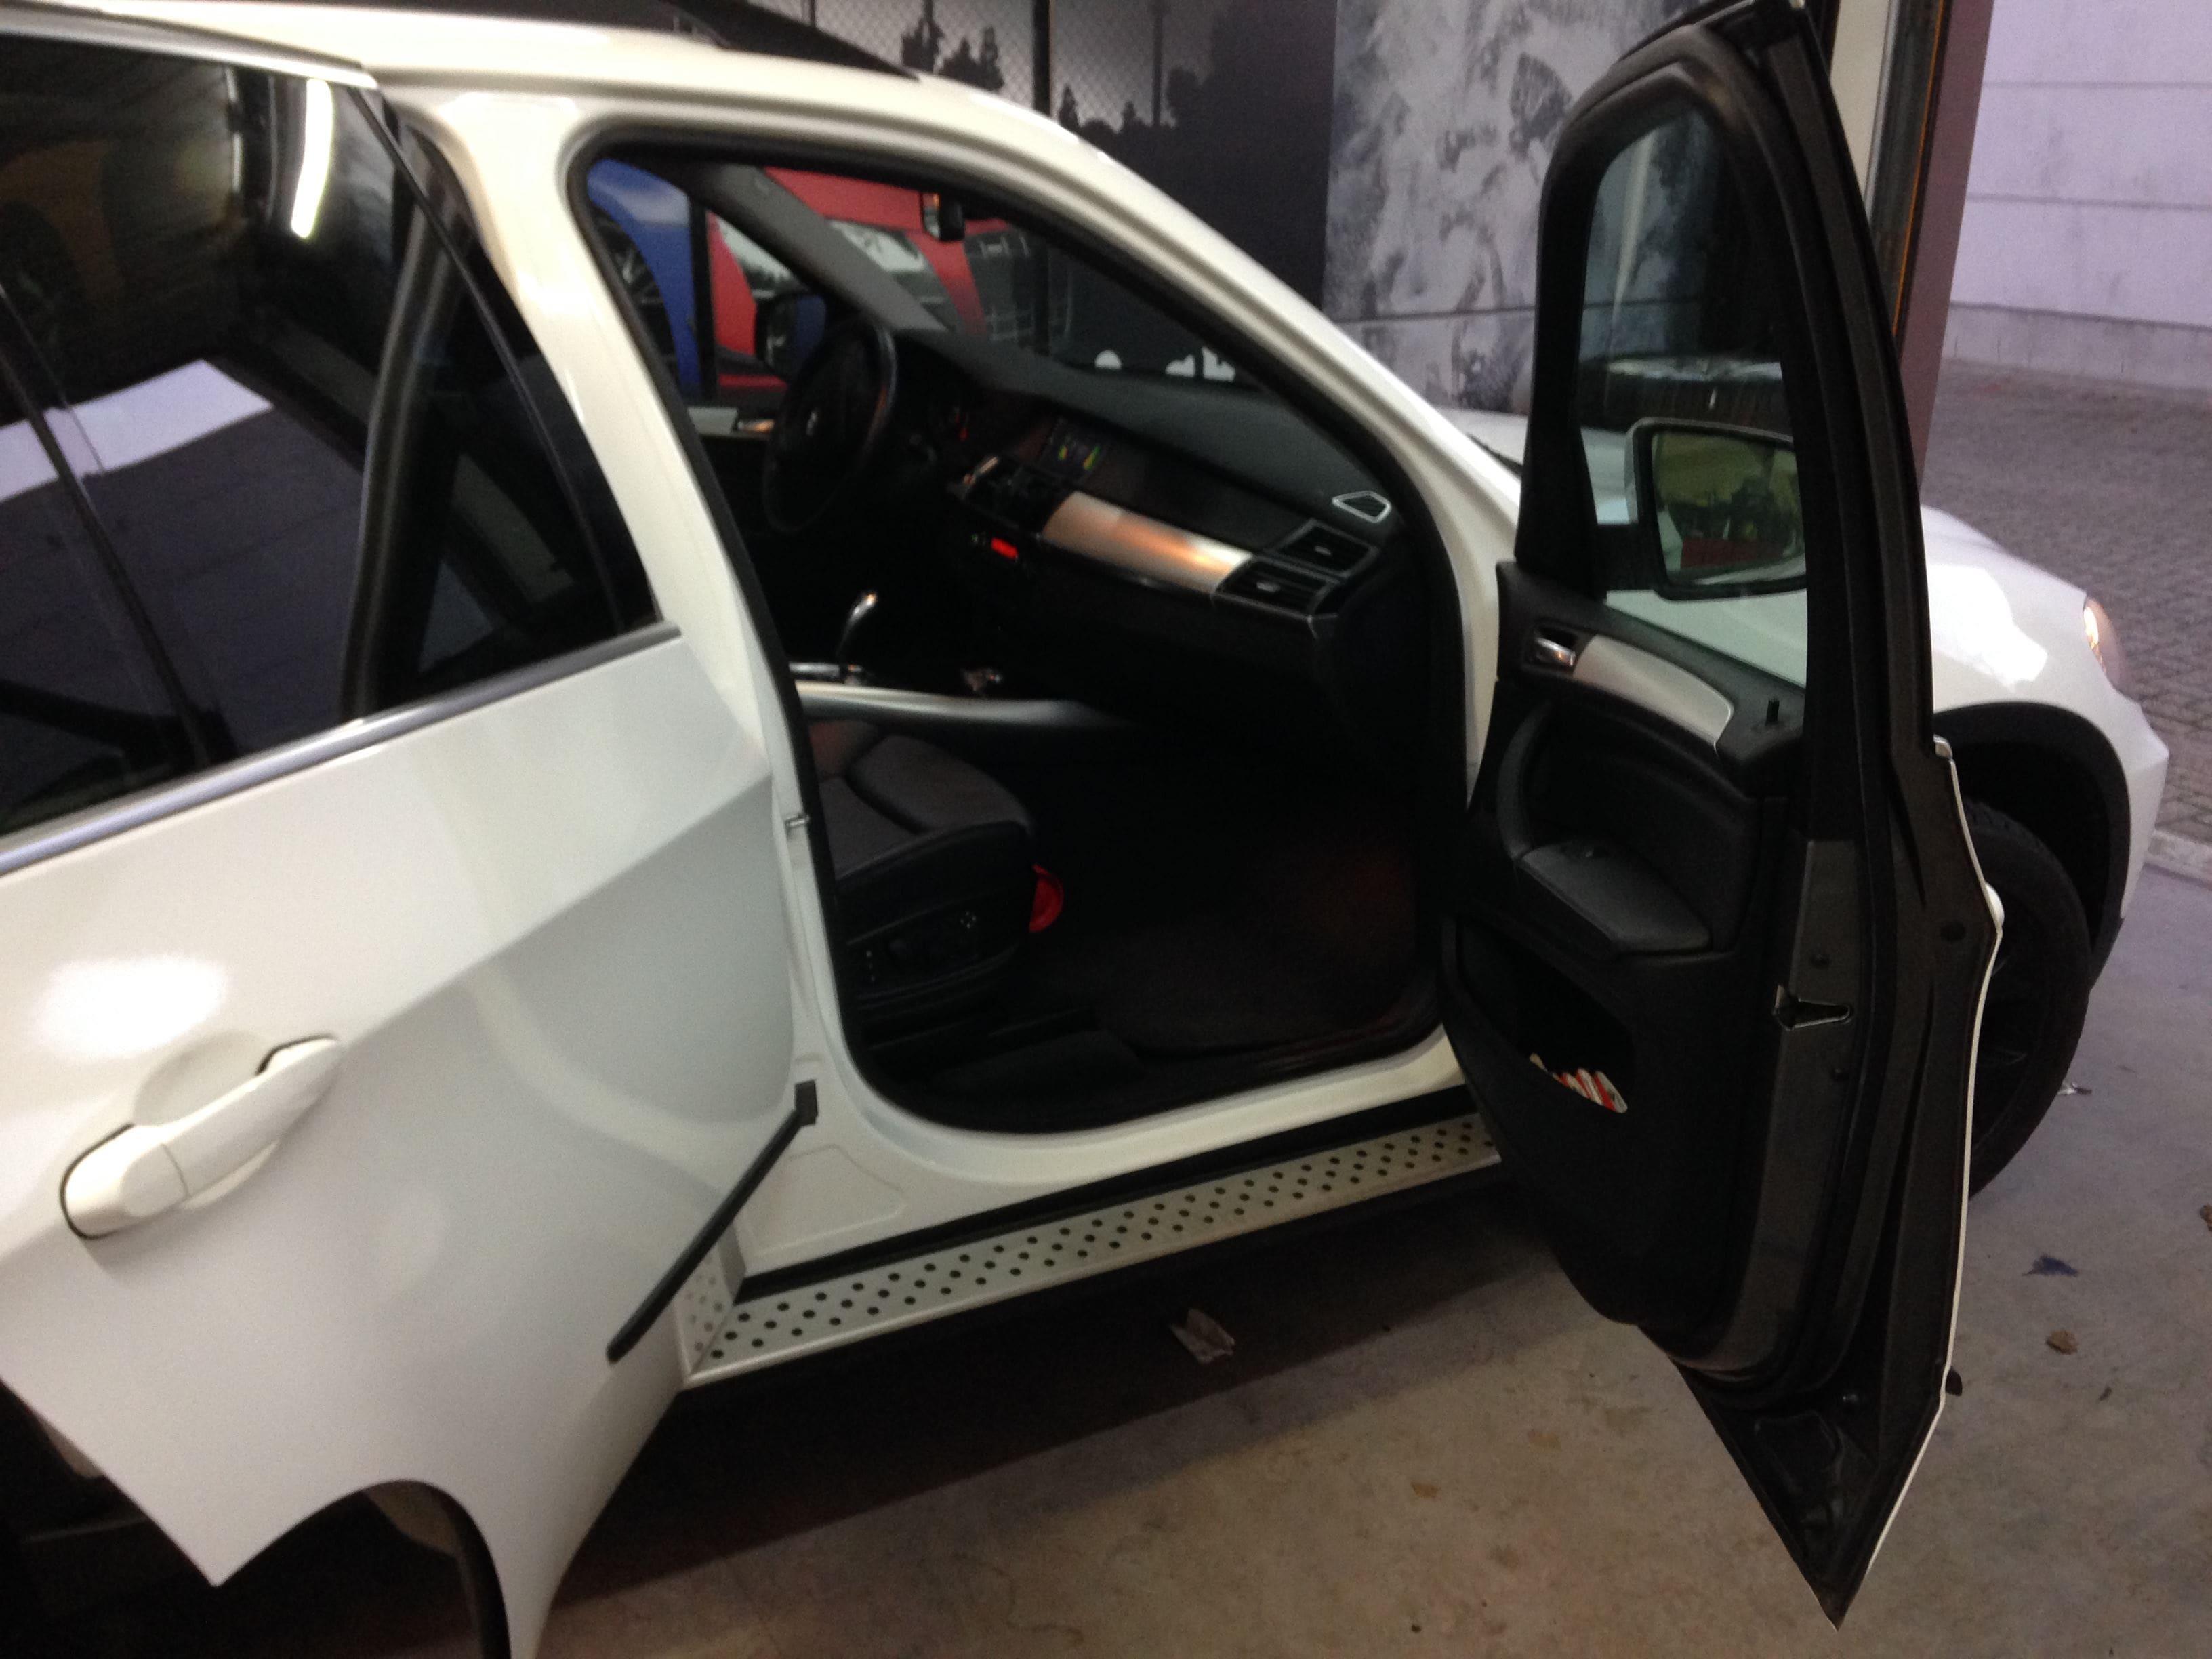 BMW X5 met Glossy White Wrap, Carwrapping door Wrapmyride.nu Foto-nr:5426, ©2021